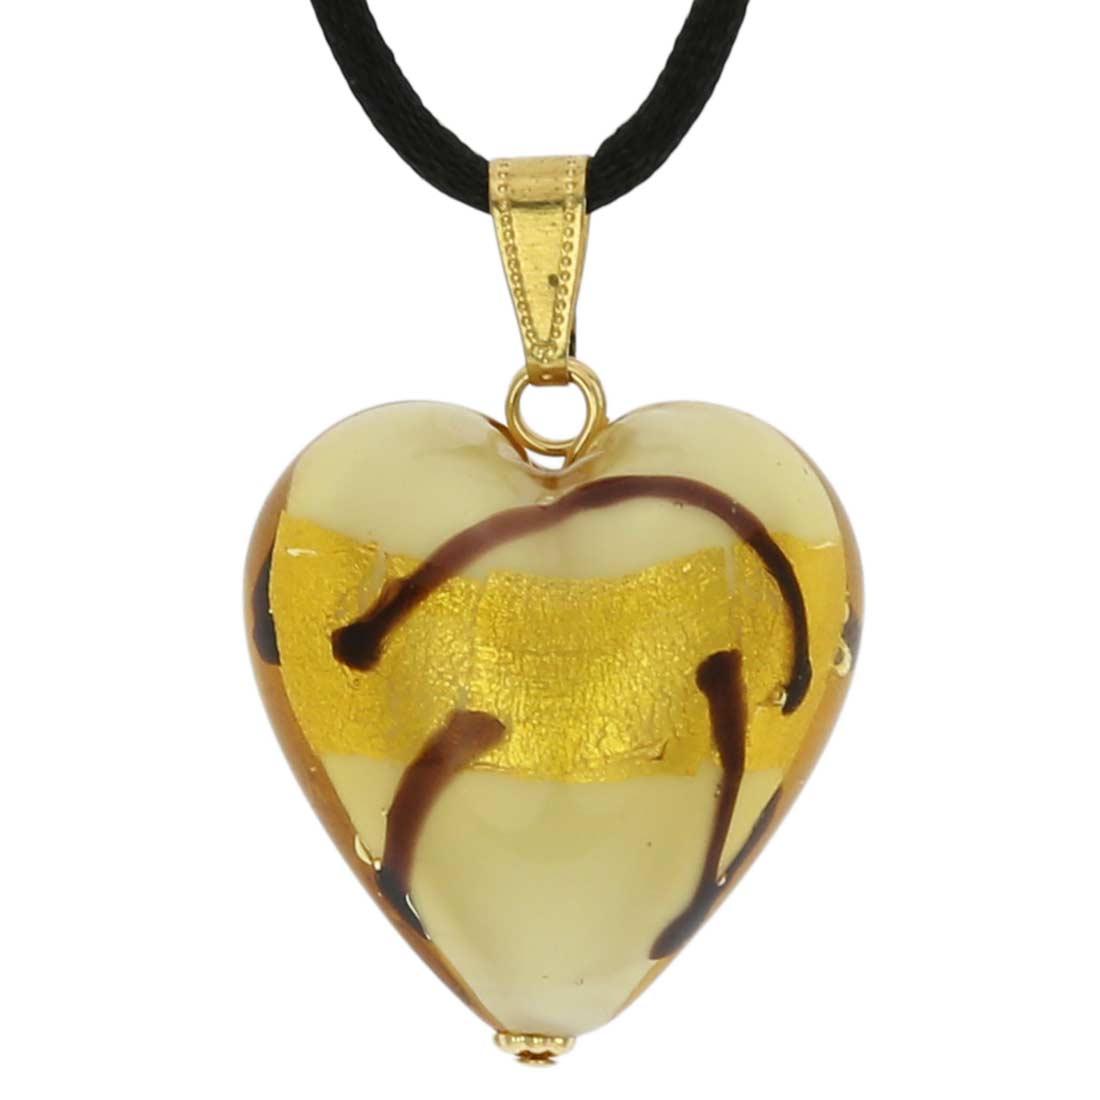 Murano Heart Pendant - Ivory Gold